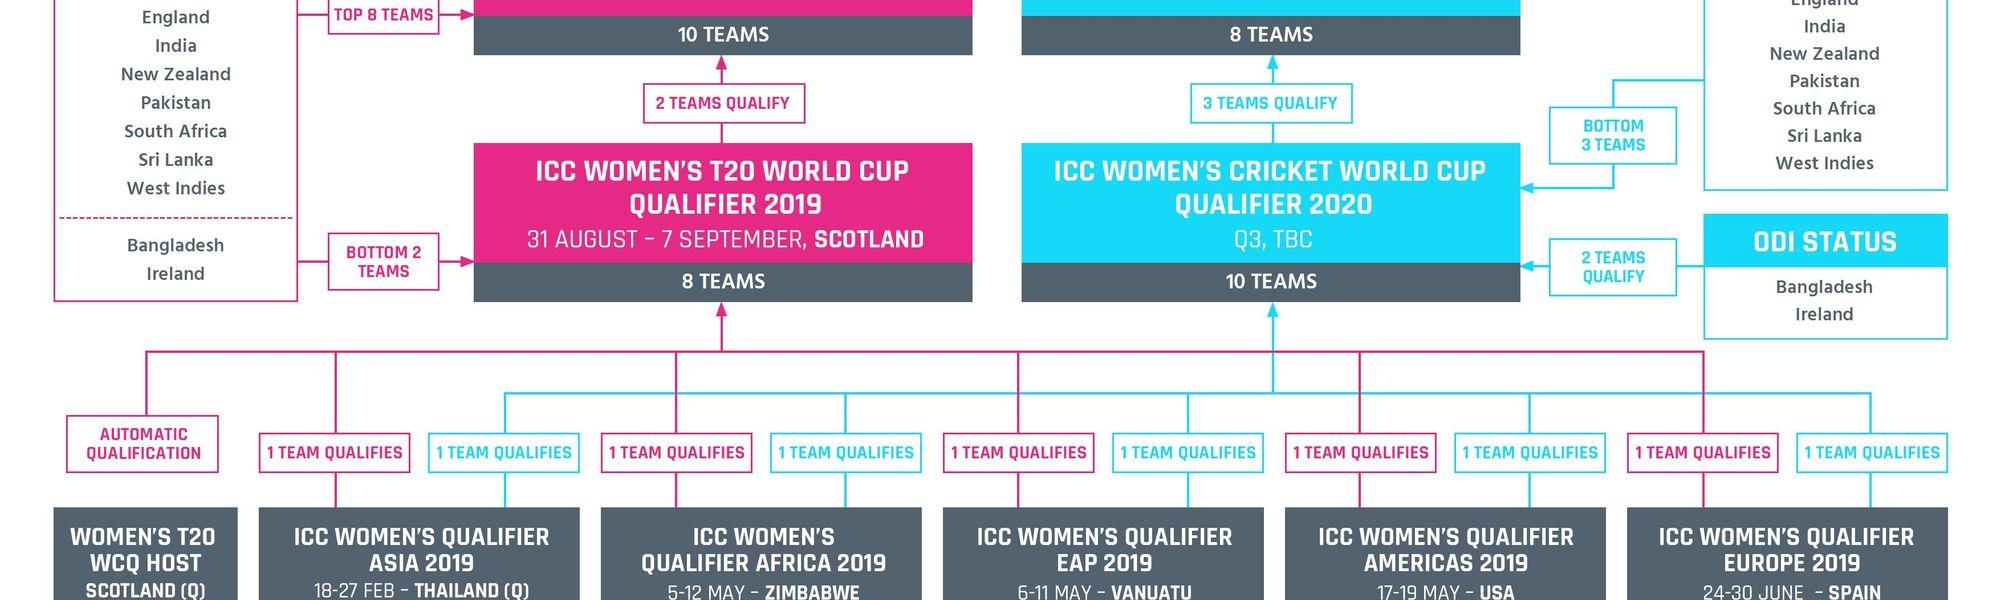 ICC WWC Qualification Pathway